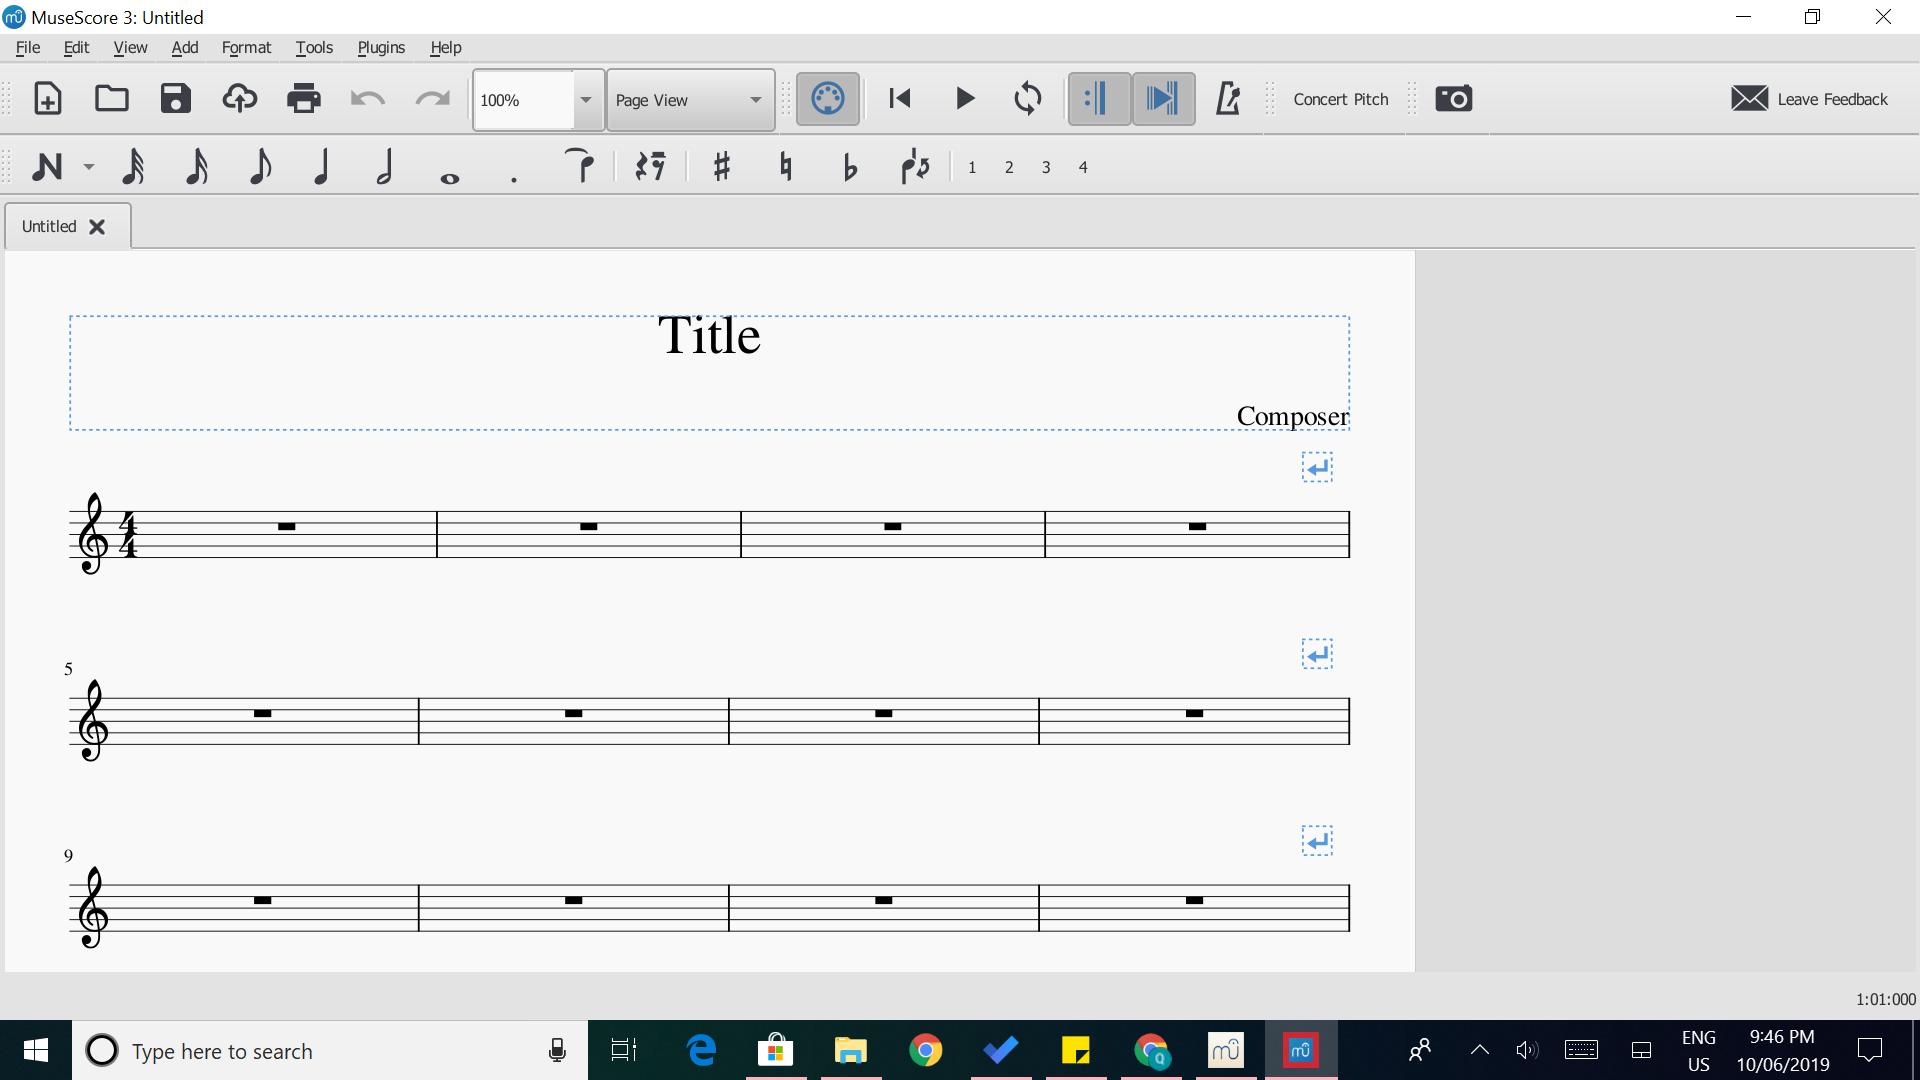 MuseScore 3 Released | MuseScore